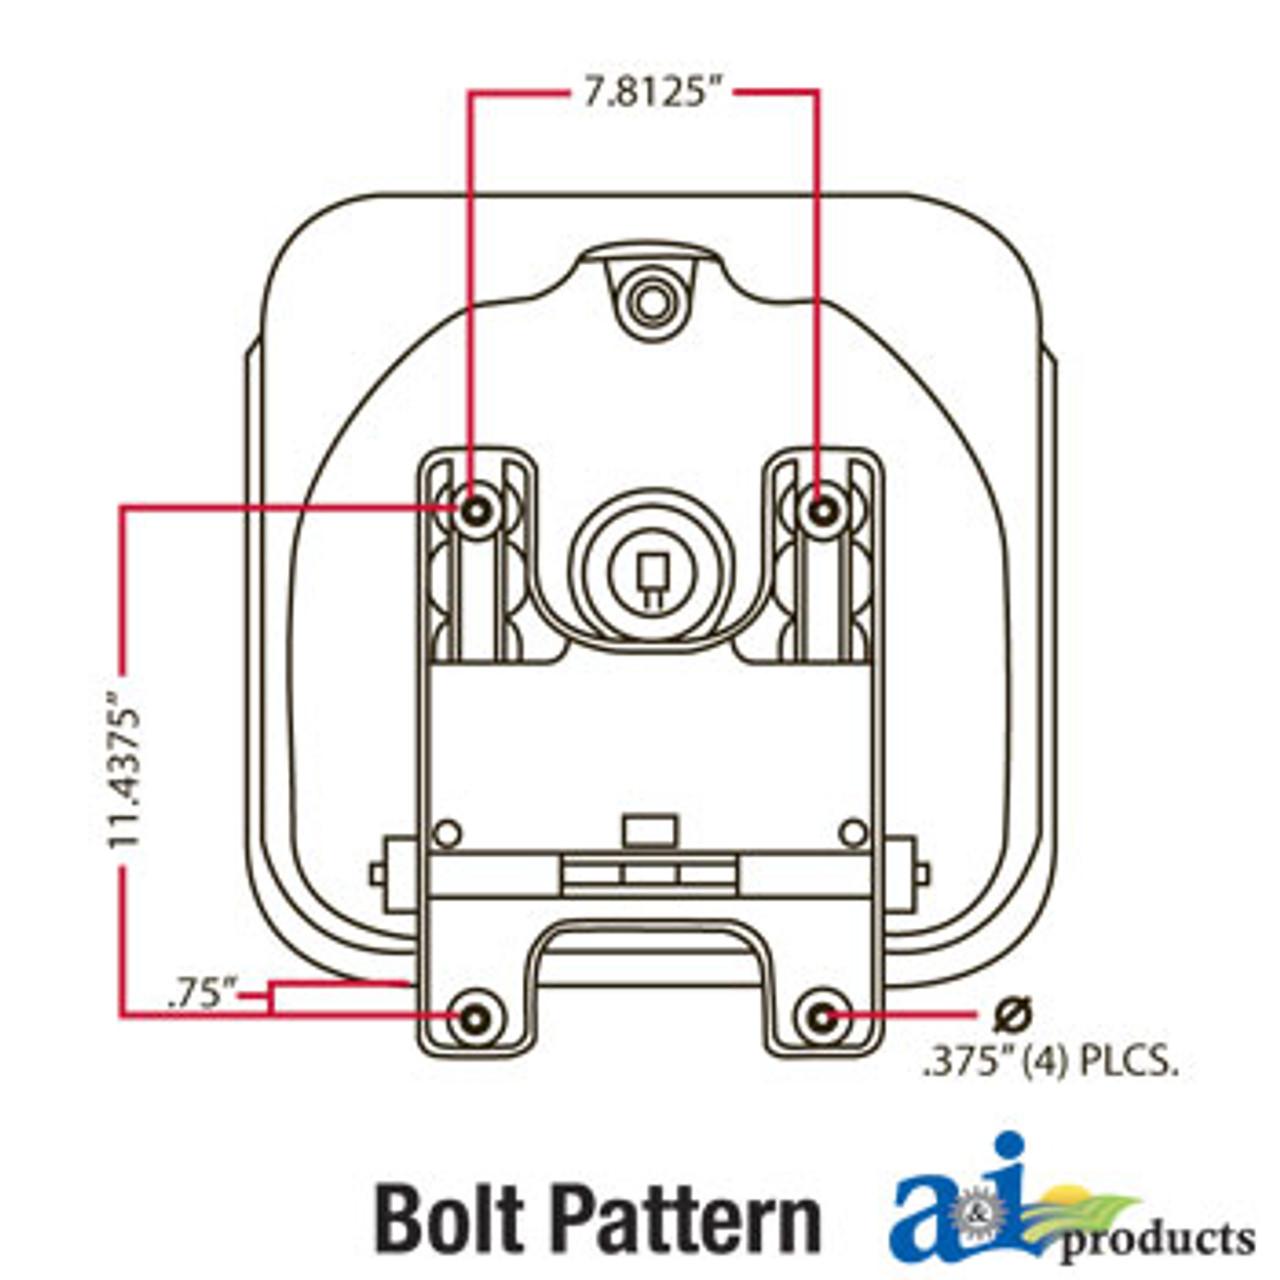 Lx277 John Deere Wiring Diagram